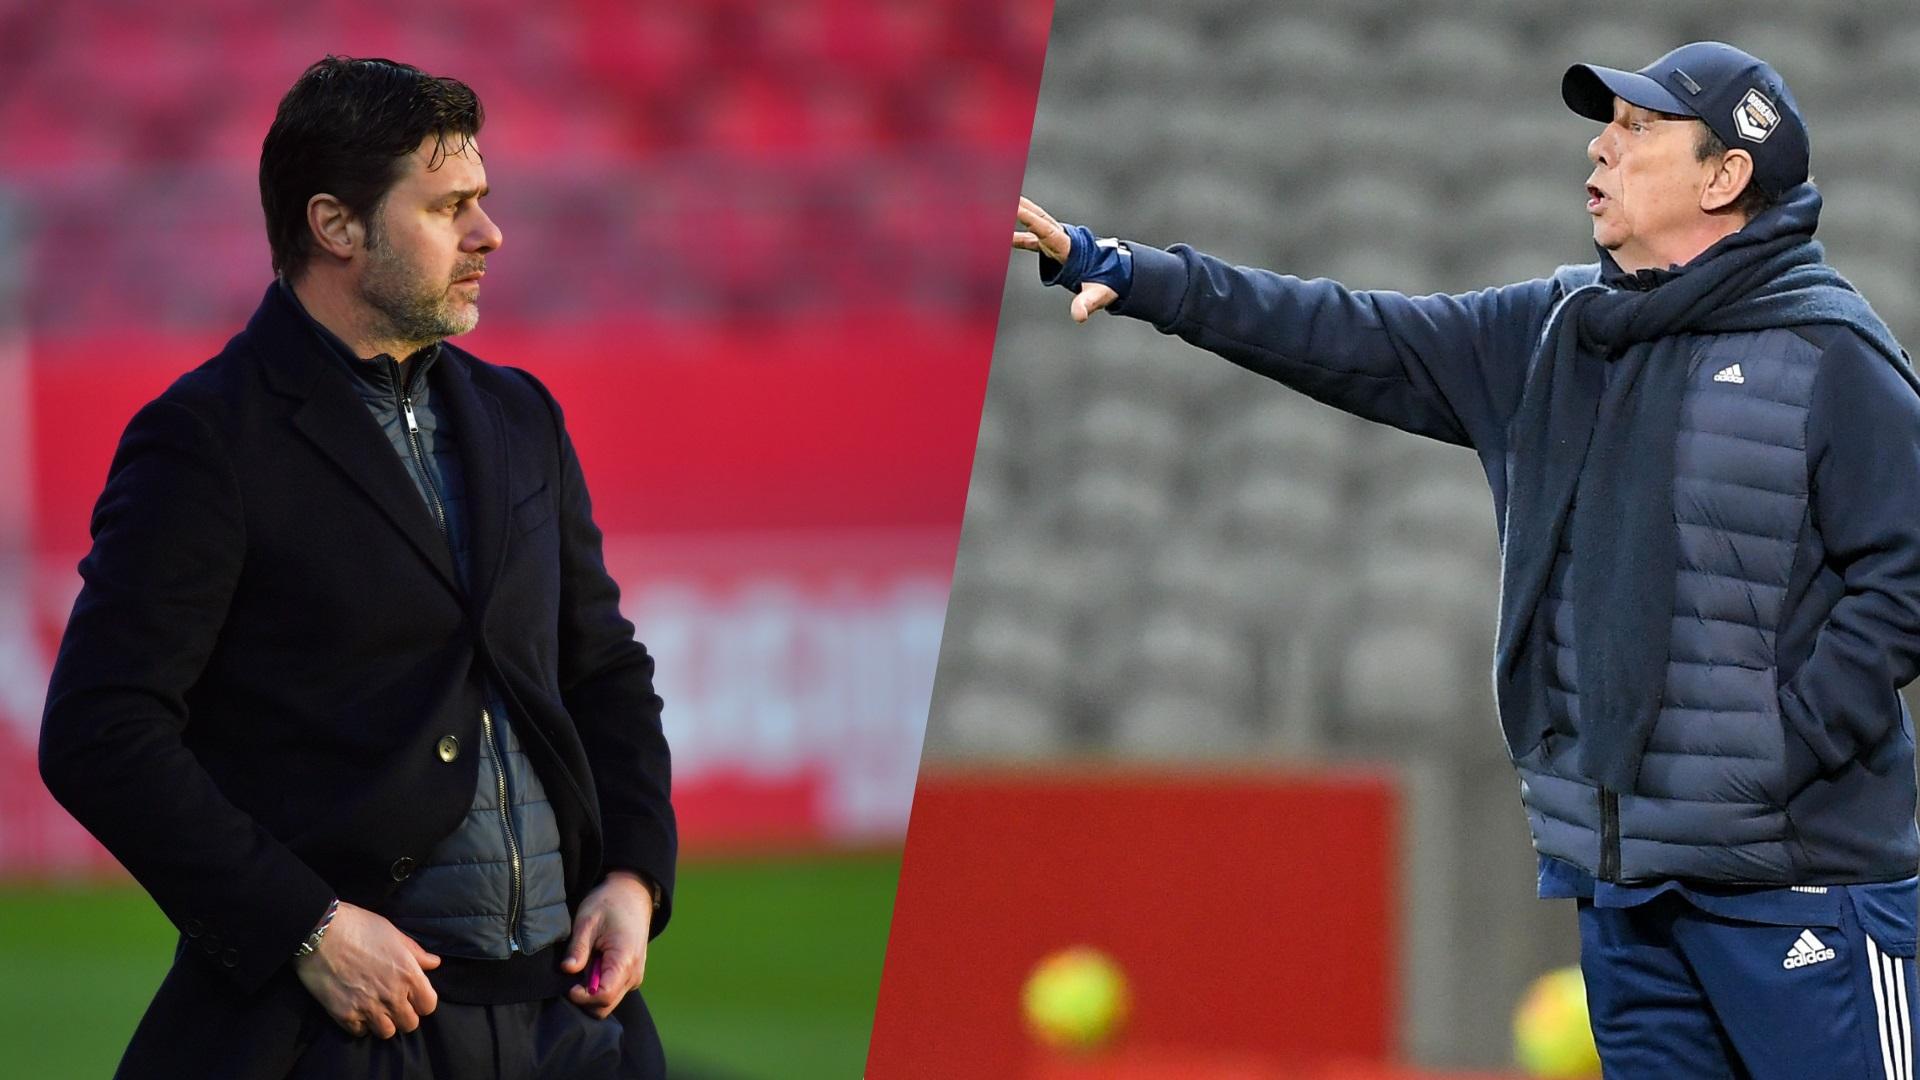 Football - Ligue 1 - PSG : Pochettino-Gasset, quand l'élève affronte le maître